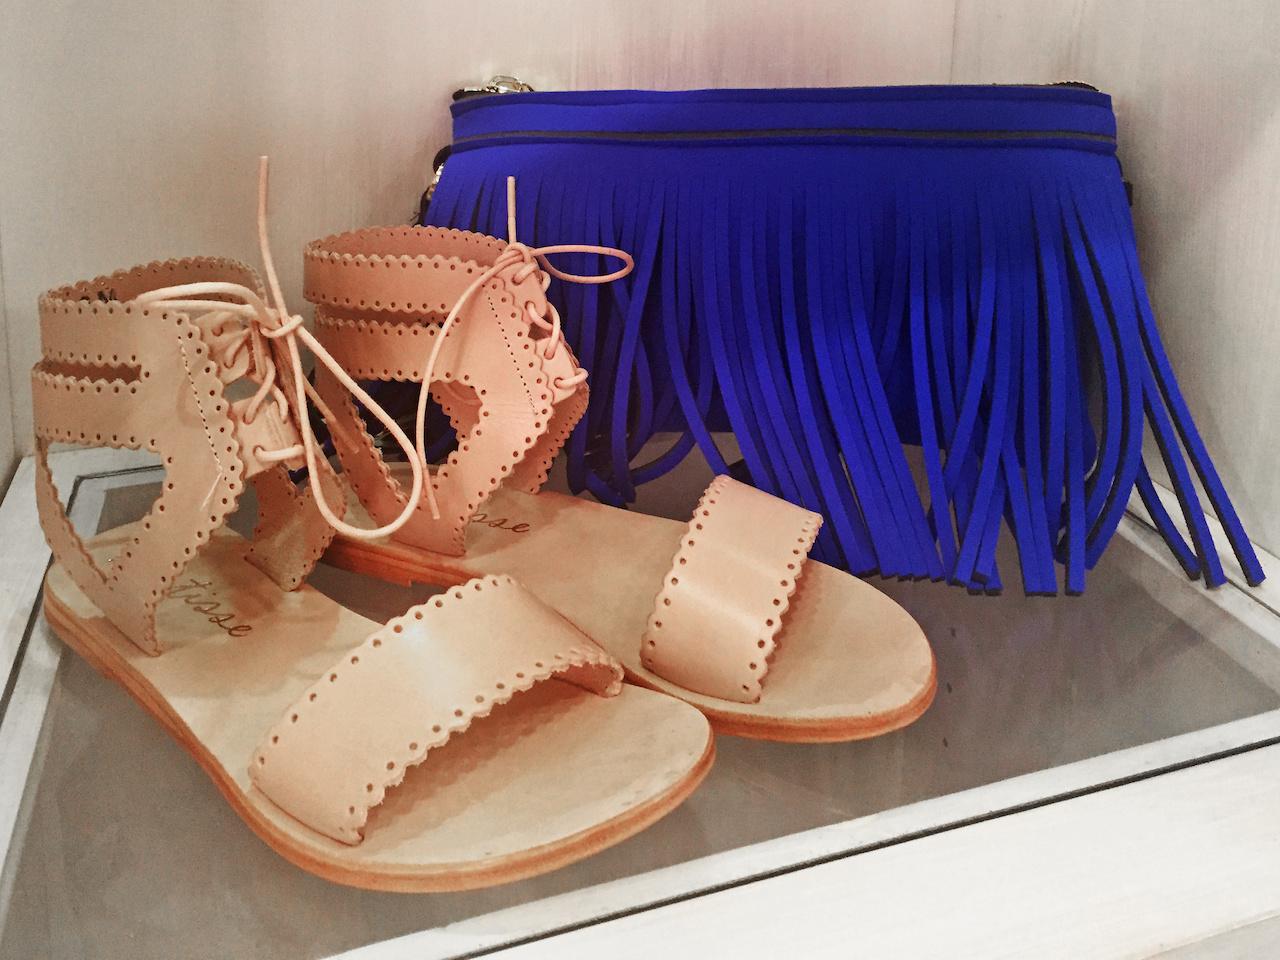 From Theadora Abbeyluxe: Matisse tan sandal, $75; Hippy blue clutch, $118